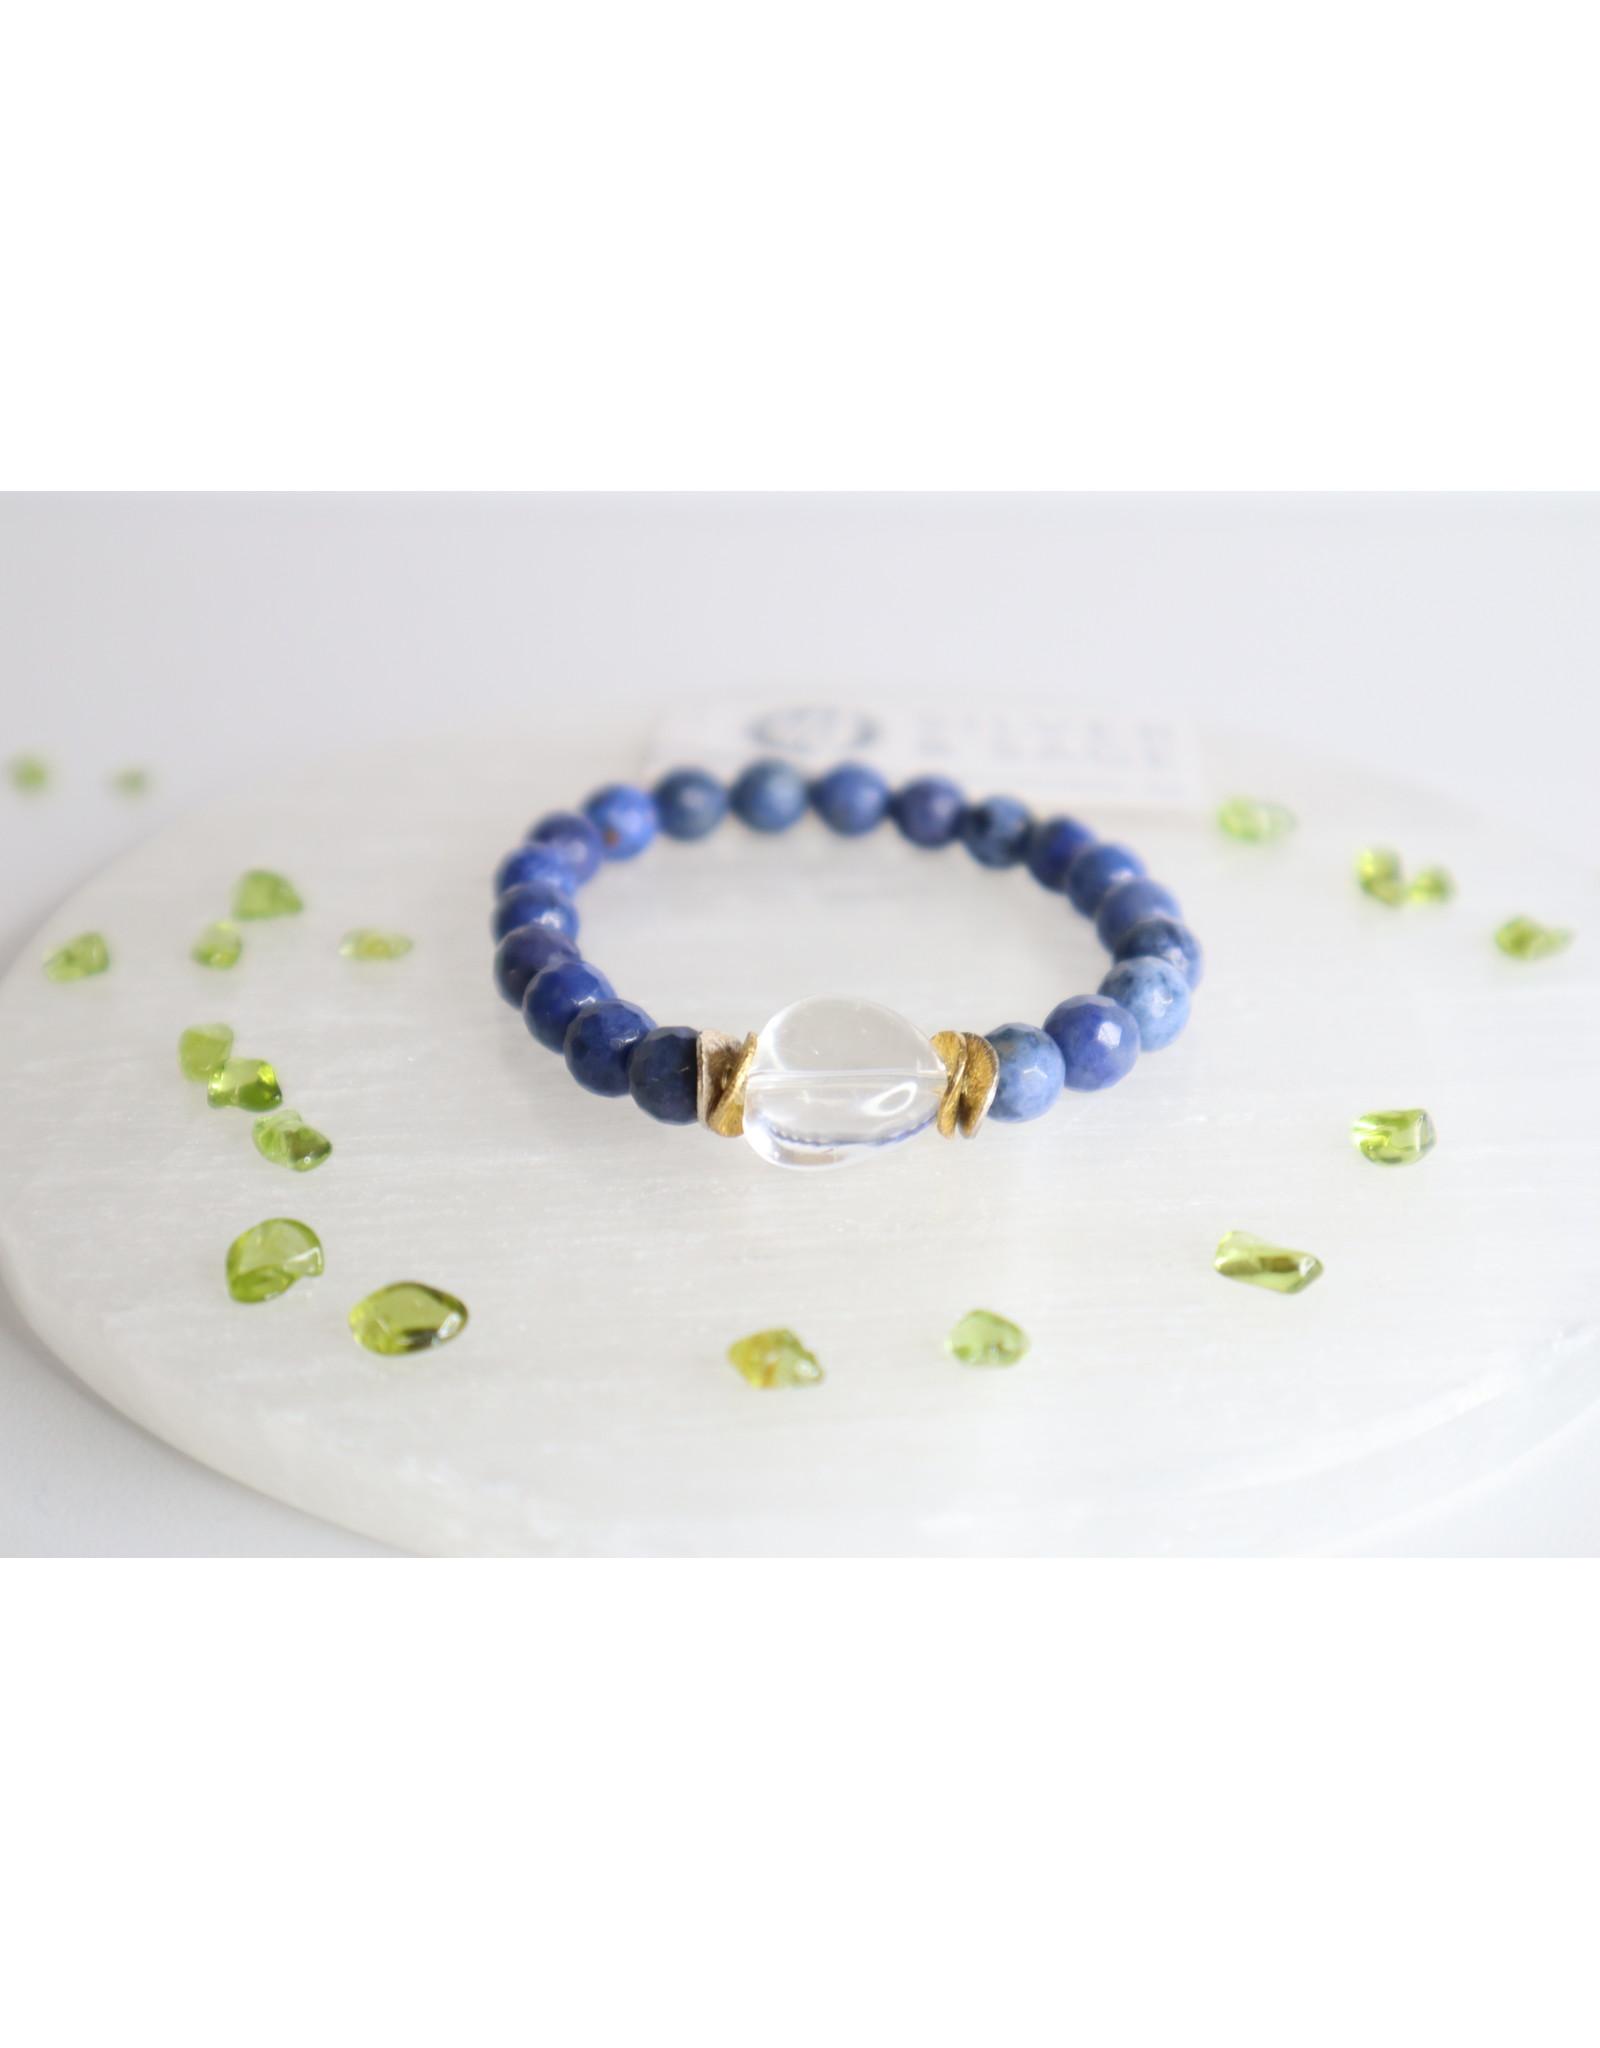 Silver & Sage - Clarity & Perseverance Bracelet